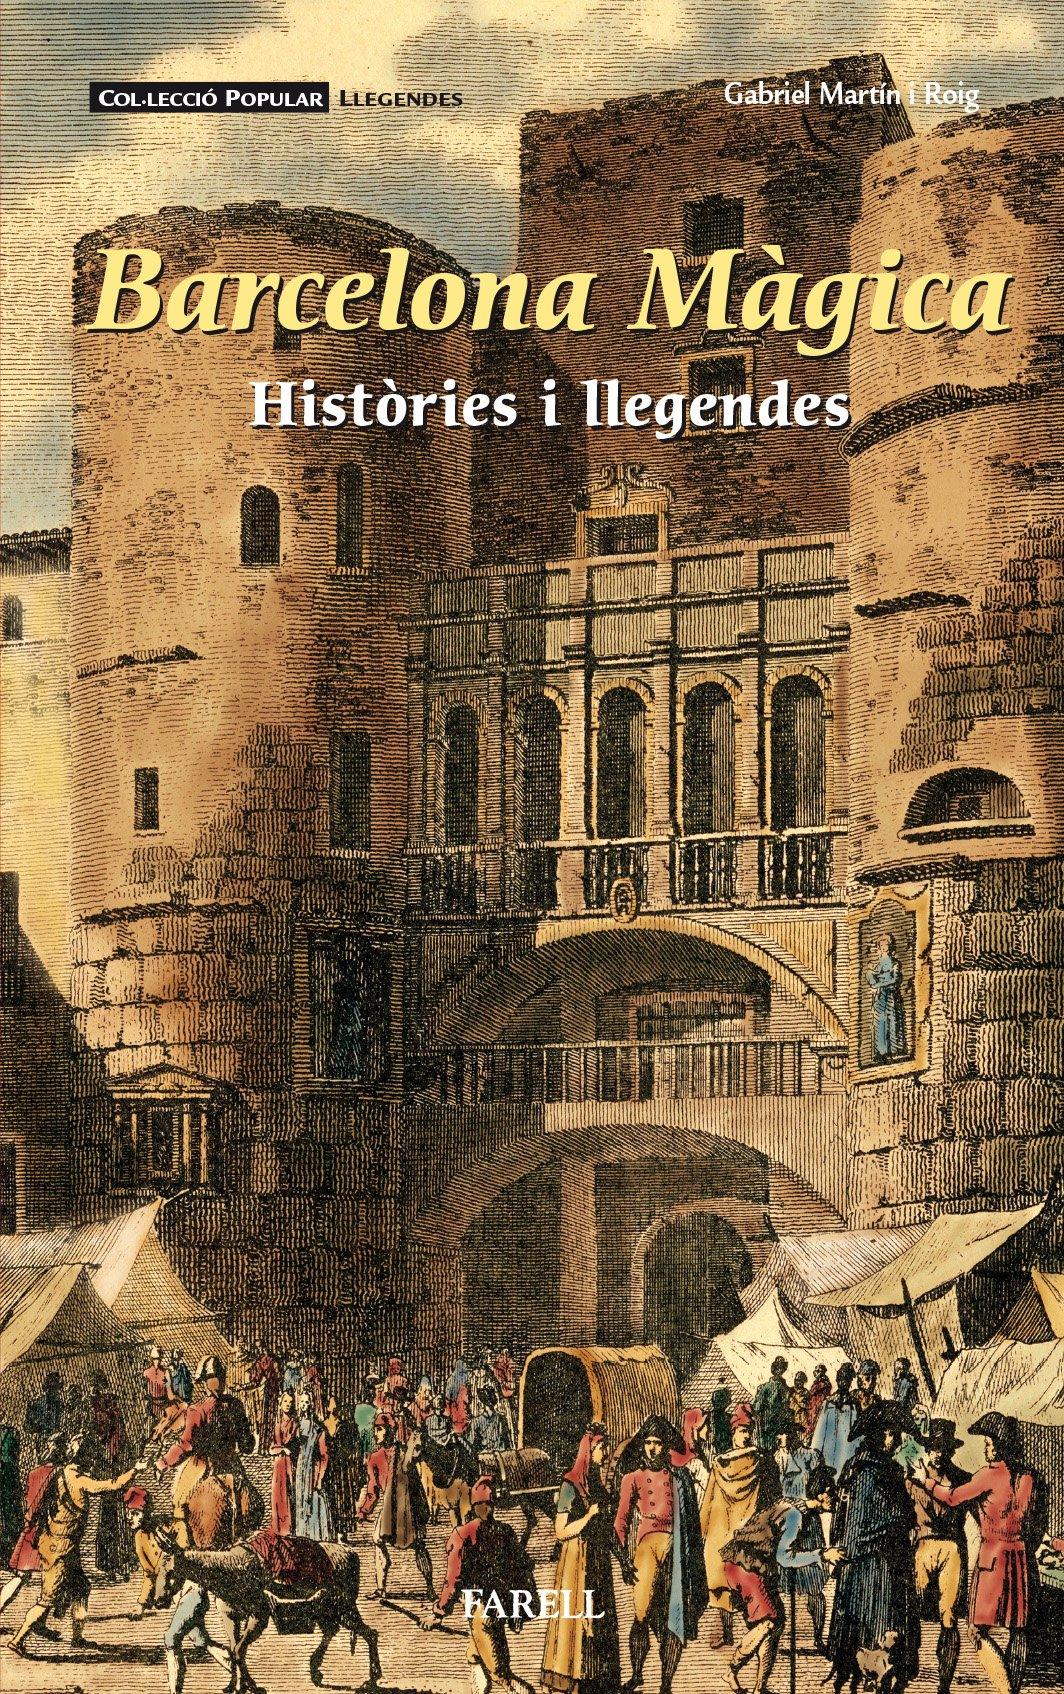 Barcelona Màgica: 34 (Popular Llegendes): Amazon.es: Martín Roig, Gabriel: Libros